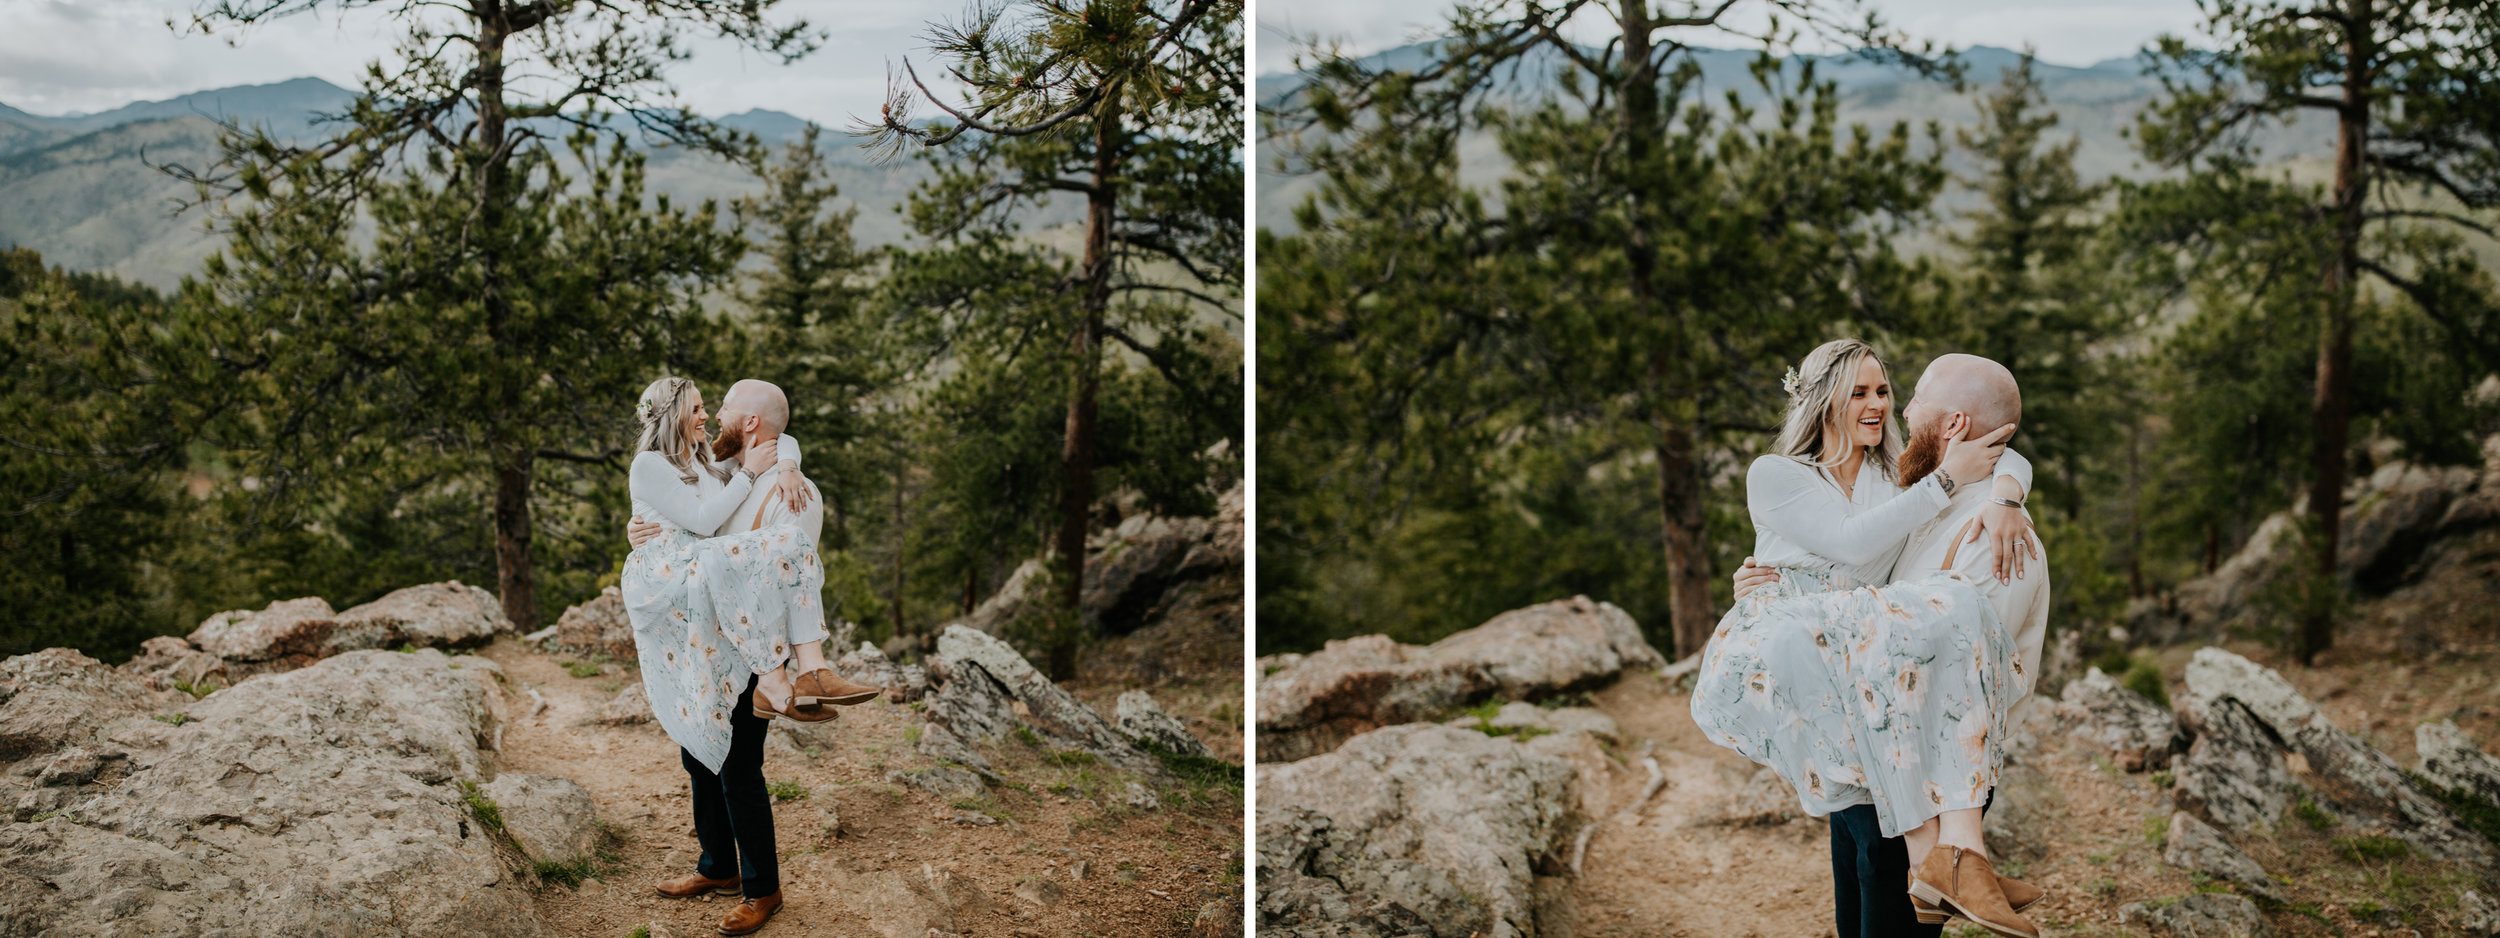 Lookout mountain engagement session denver colorado photographer 6.jpg